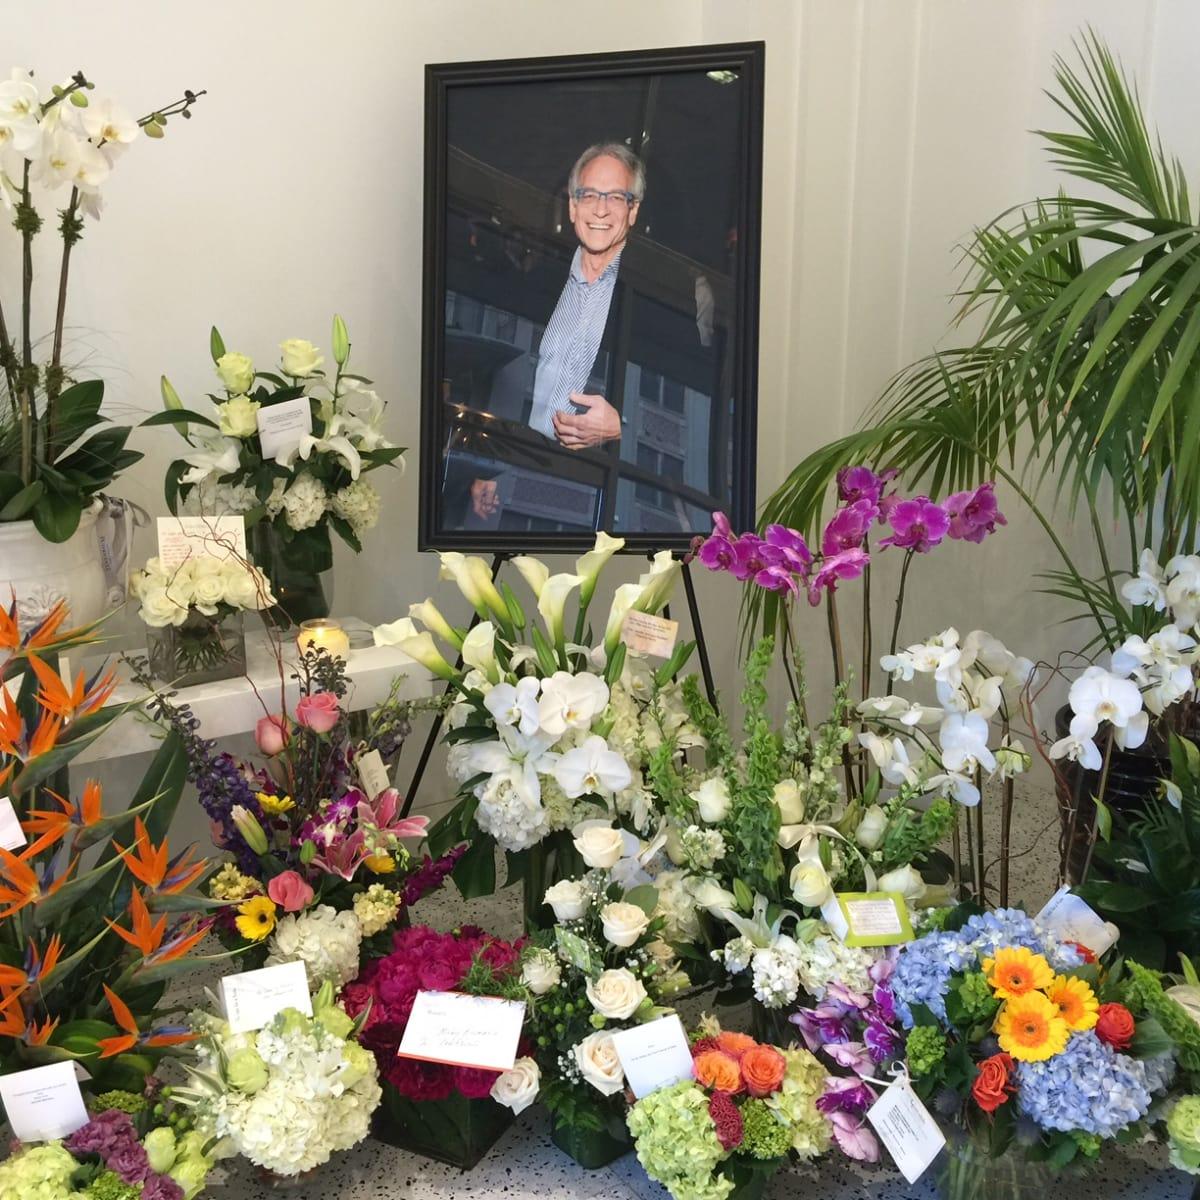 Mickey's Memorial 6/16 flowers